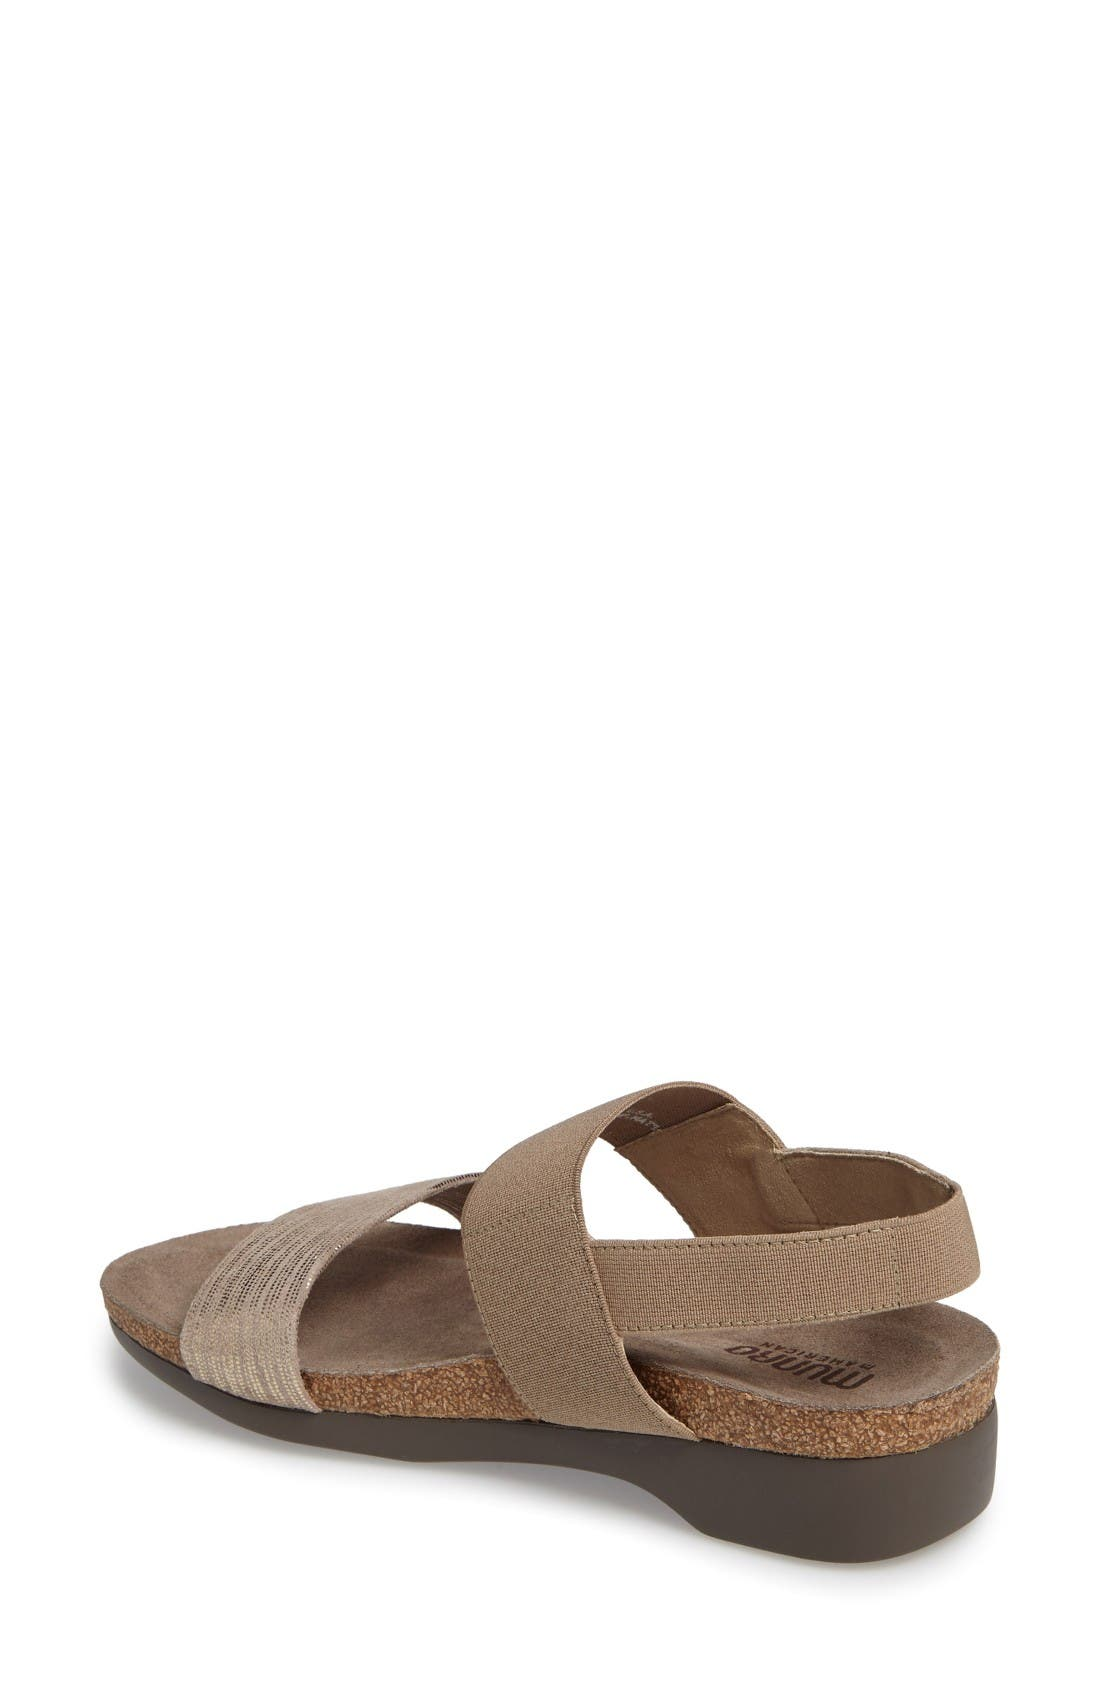 5116e9a19adf8 Women s Sandals Narrow Shoes